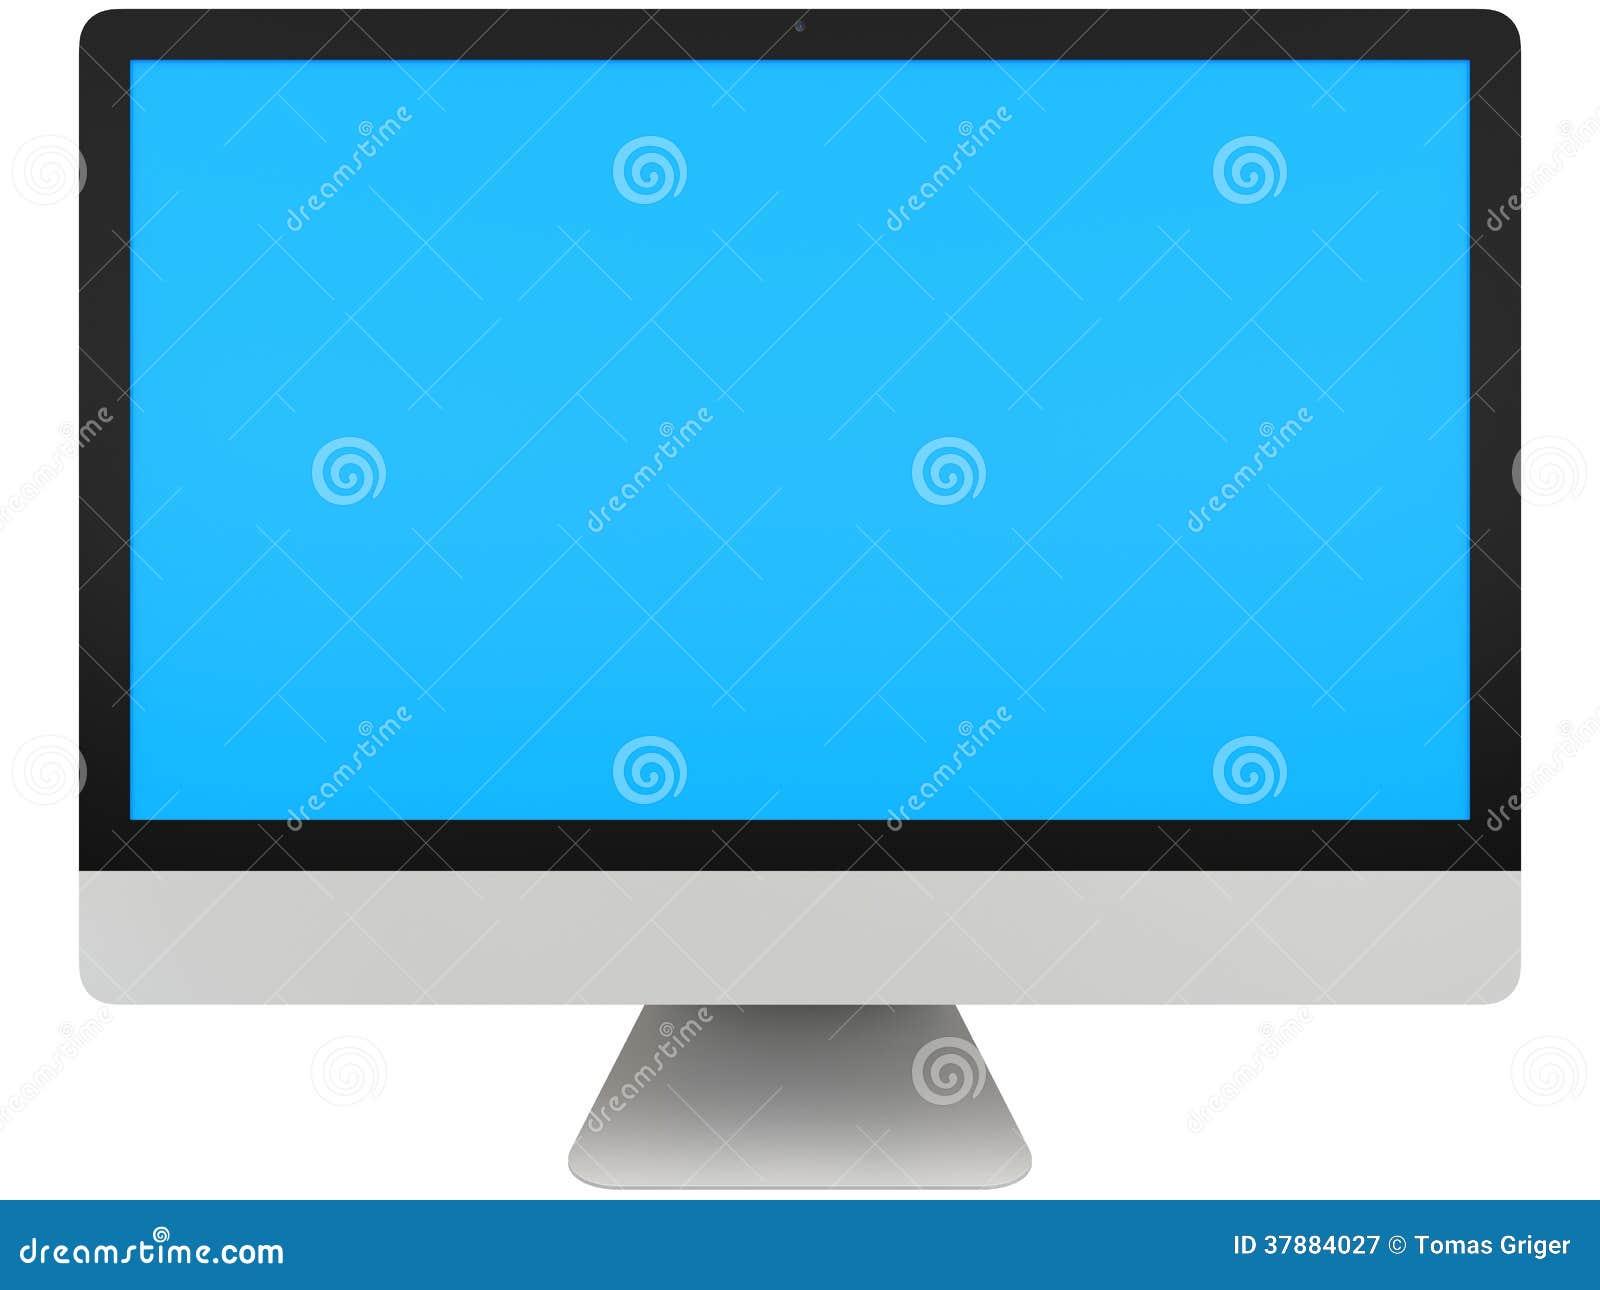 Bureaucomputer